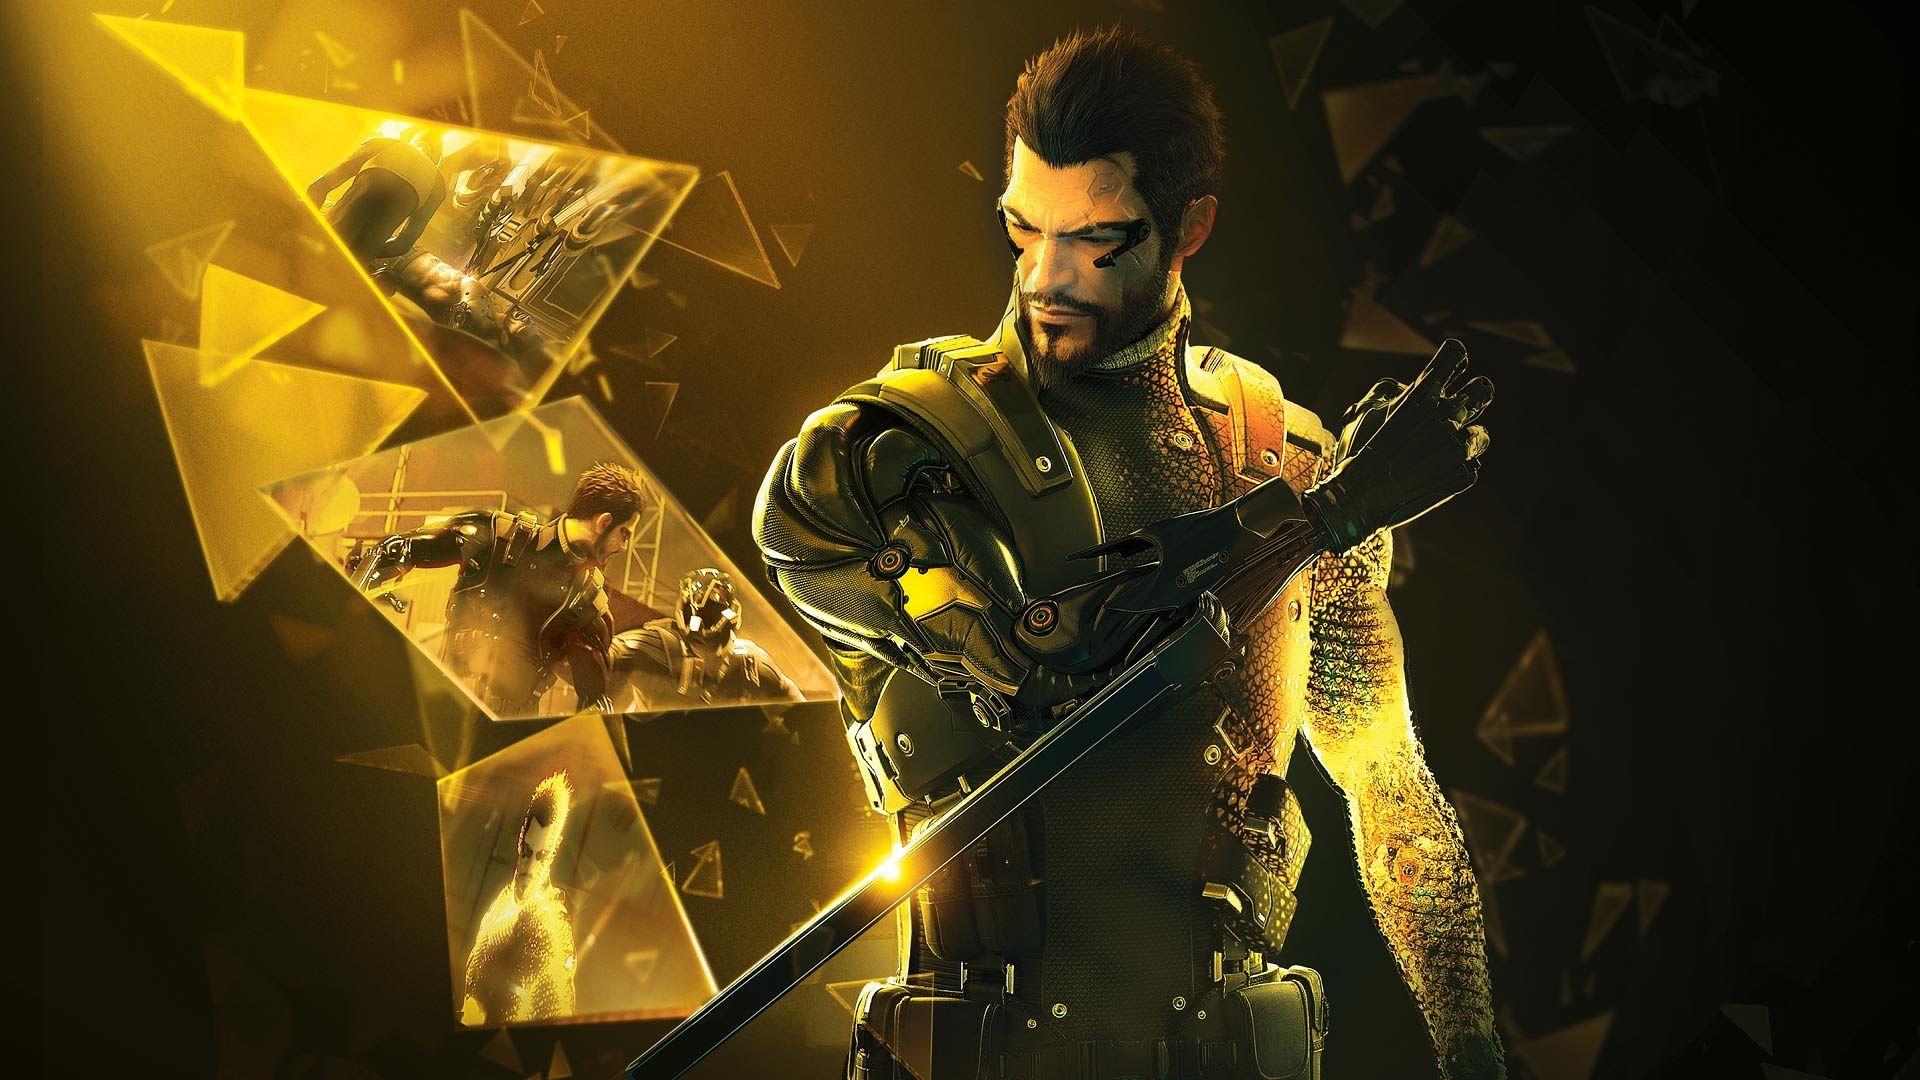 Deus Ex 1 Wallpaper